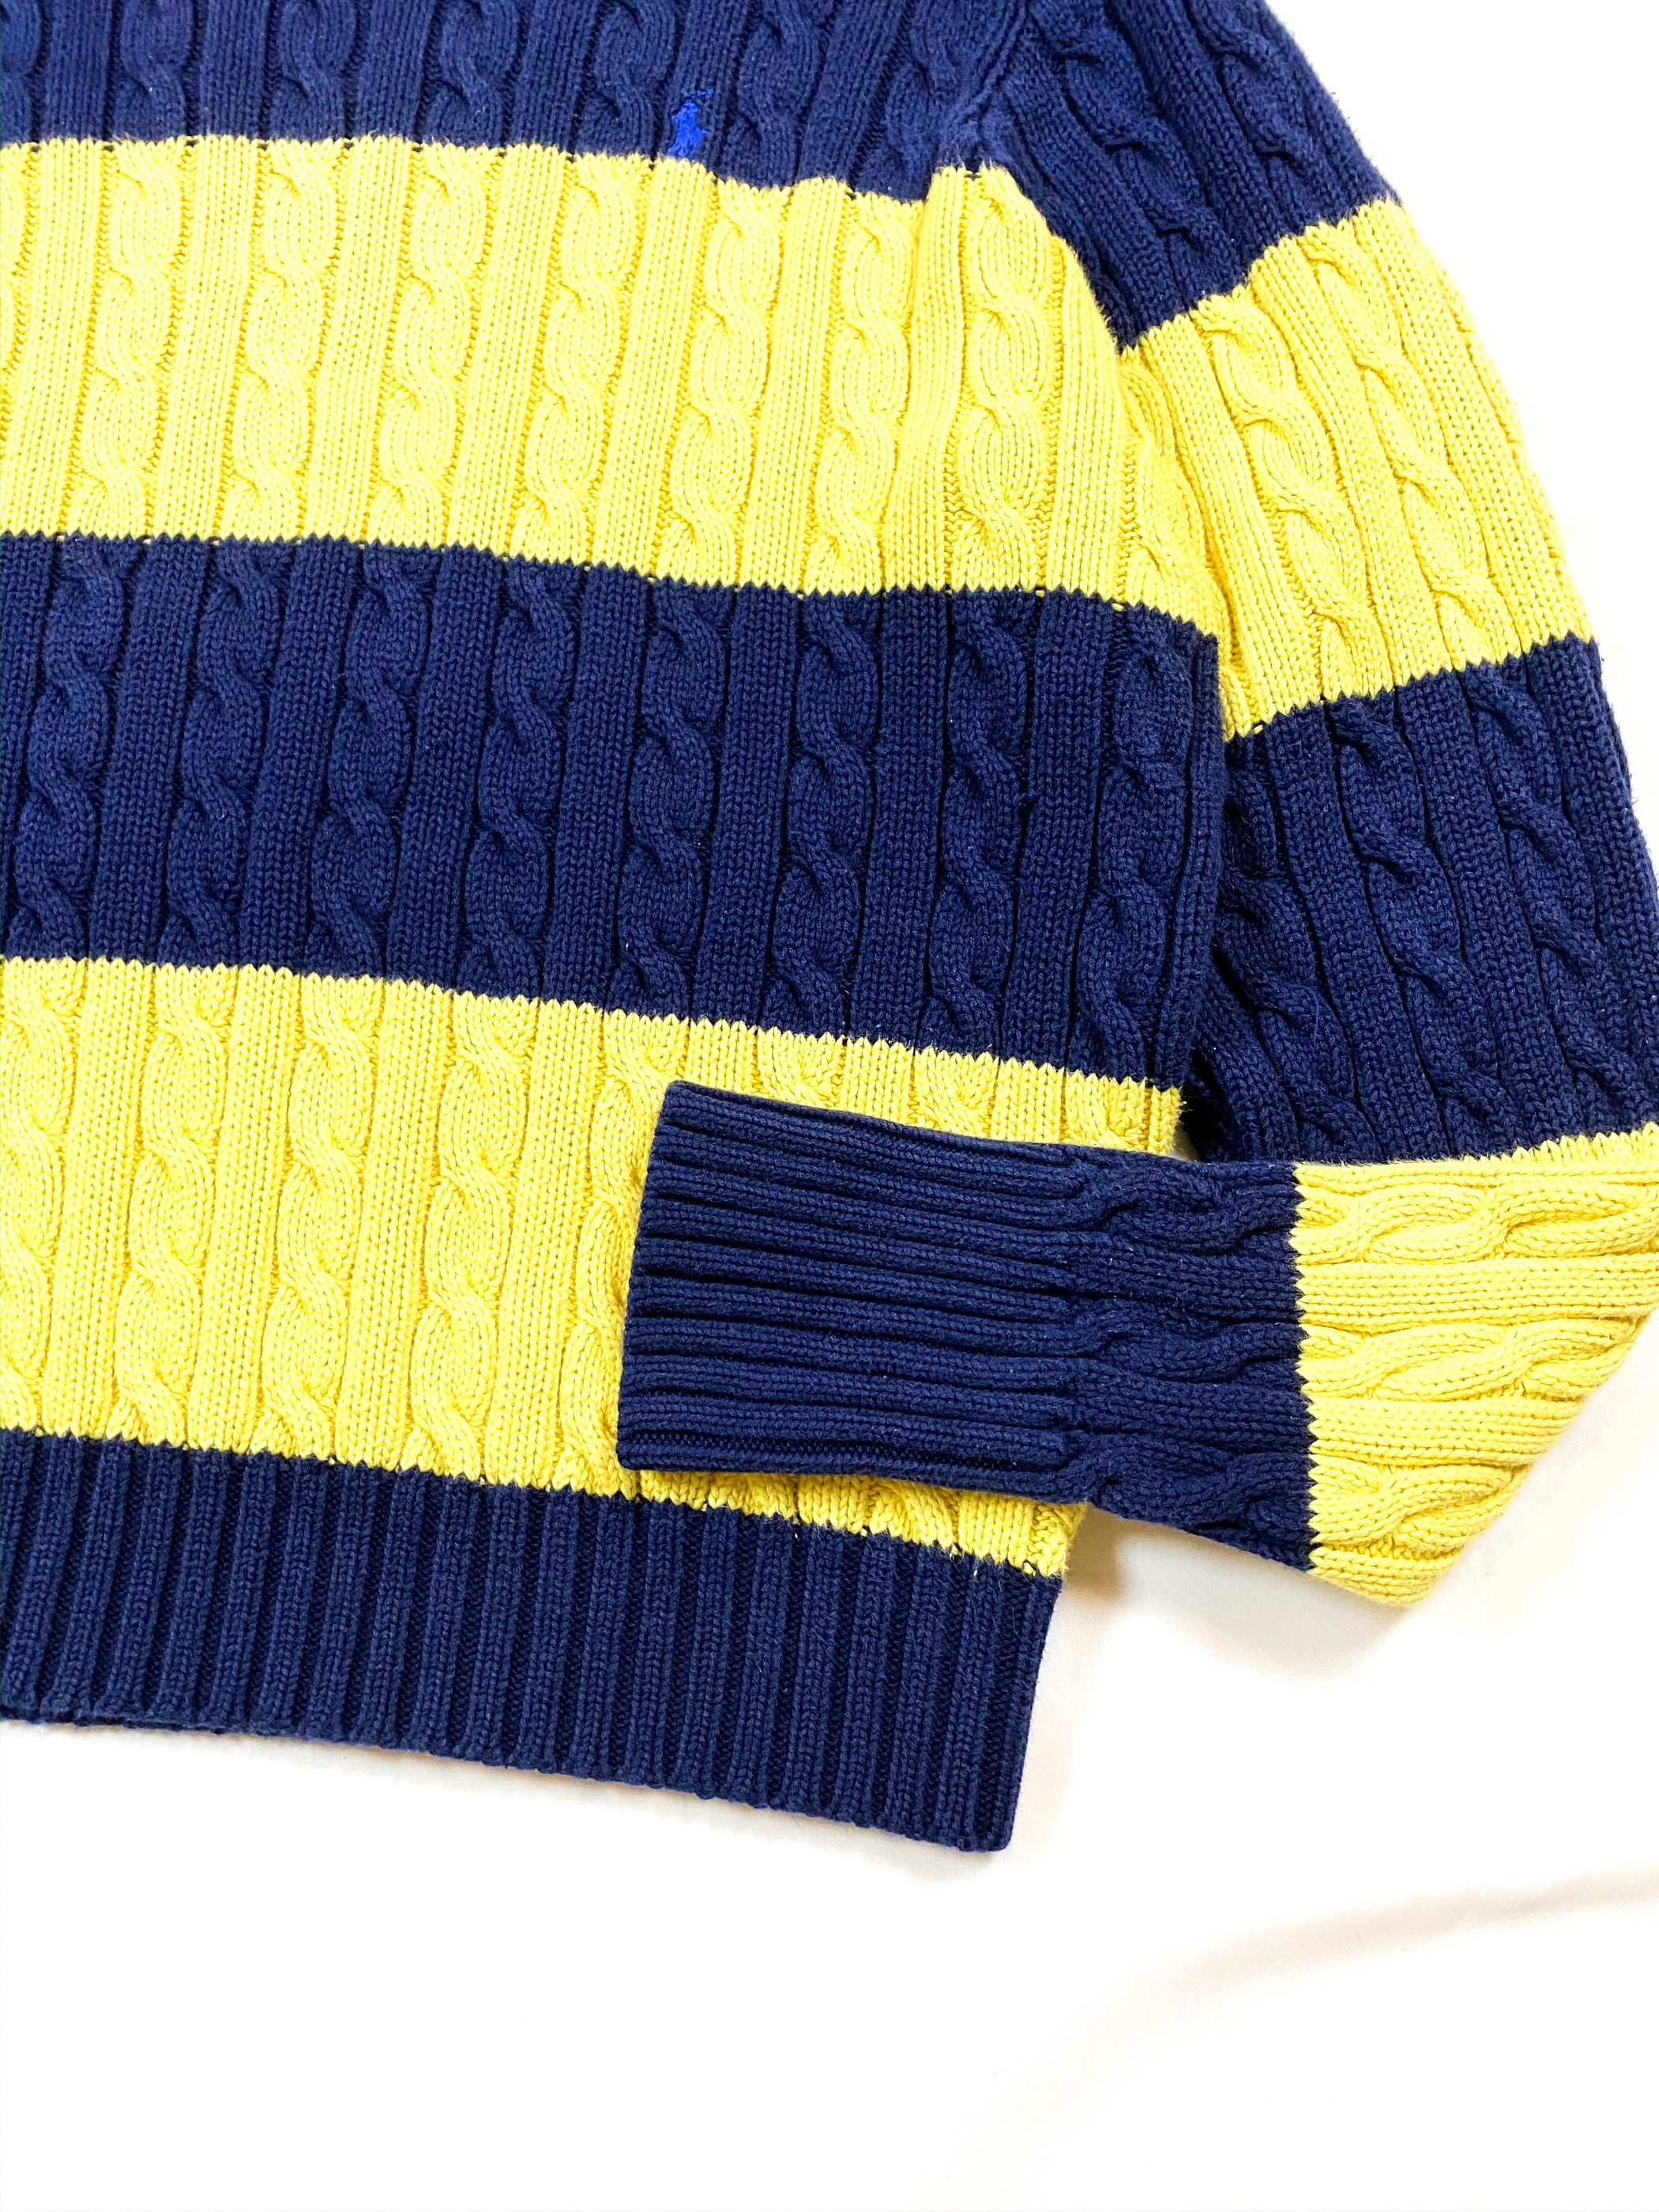 Ralph Lauren cotton border knit sweater